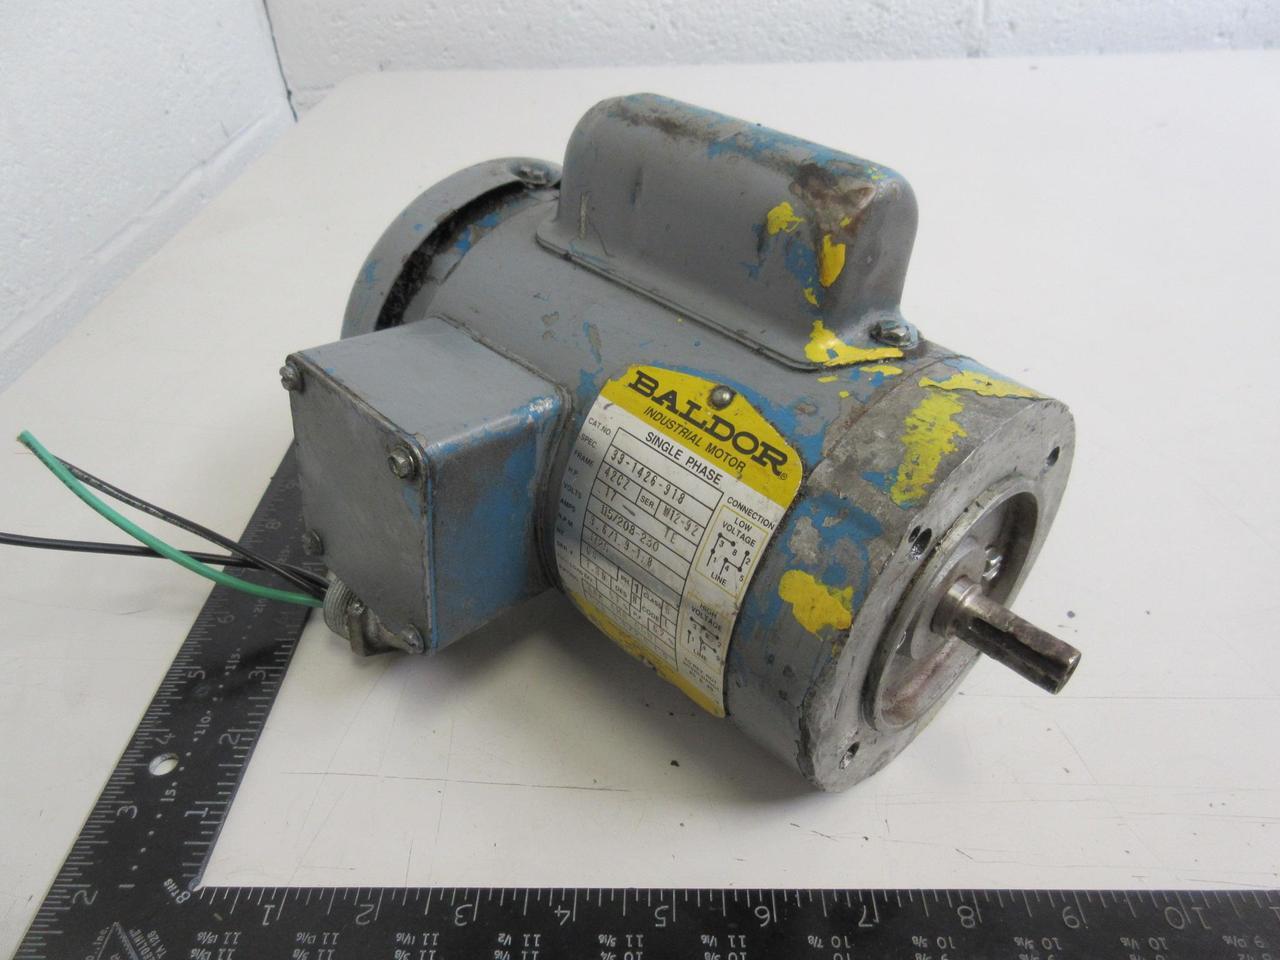 Baldor 33-1426-918 Single Phase Motor, 1/6 HP, 115/208-230 V, 1725 RPM, Fr  42CZ T97397